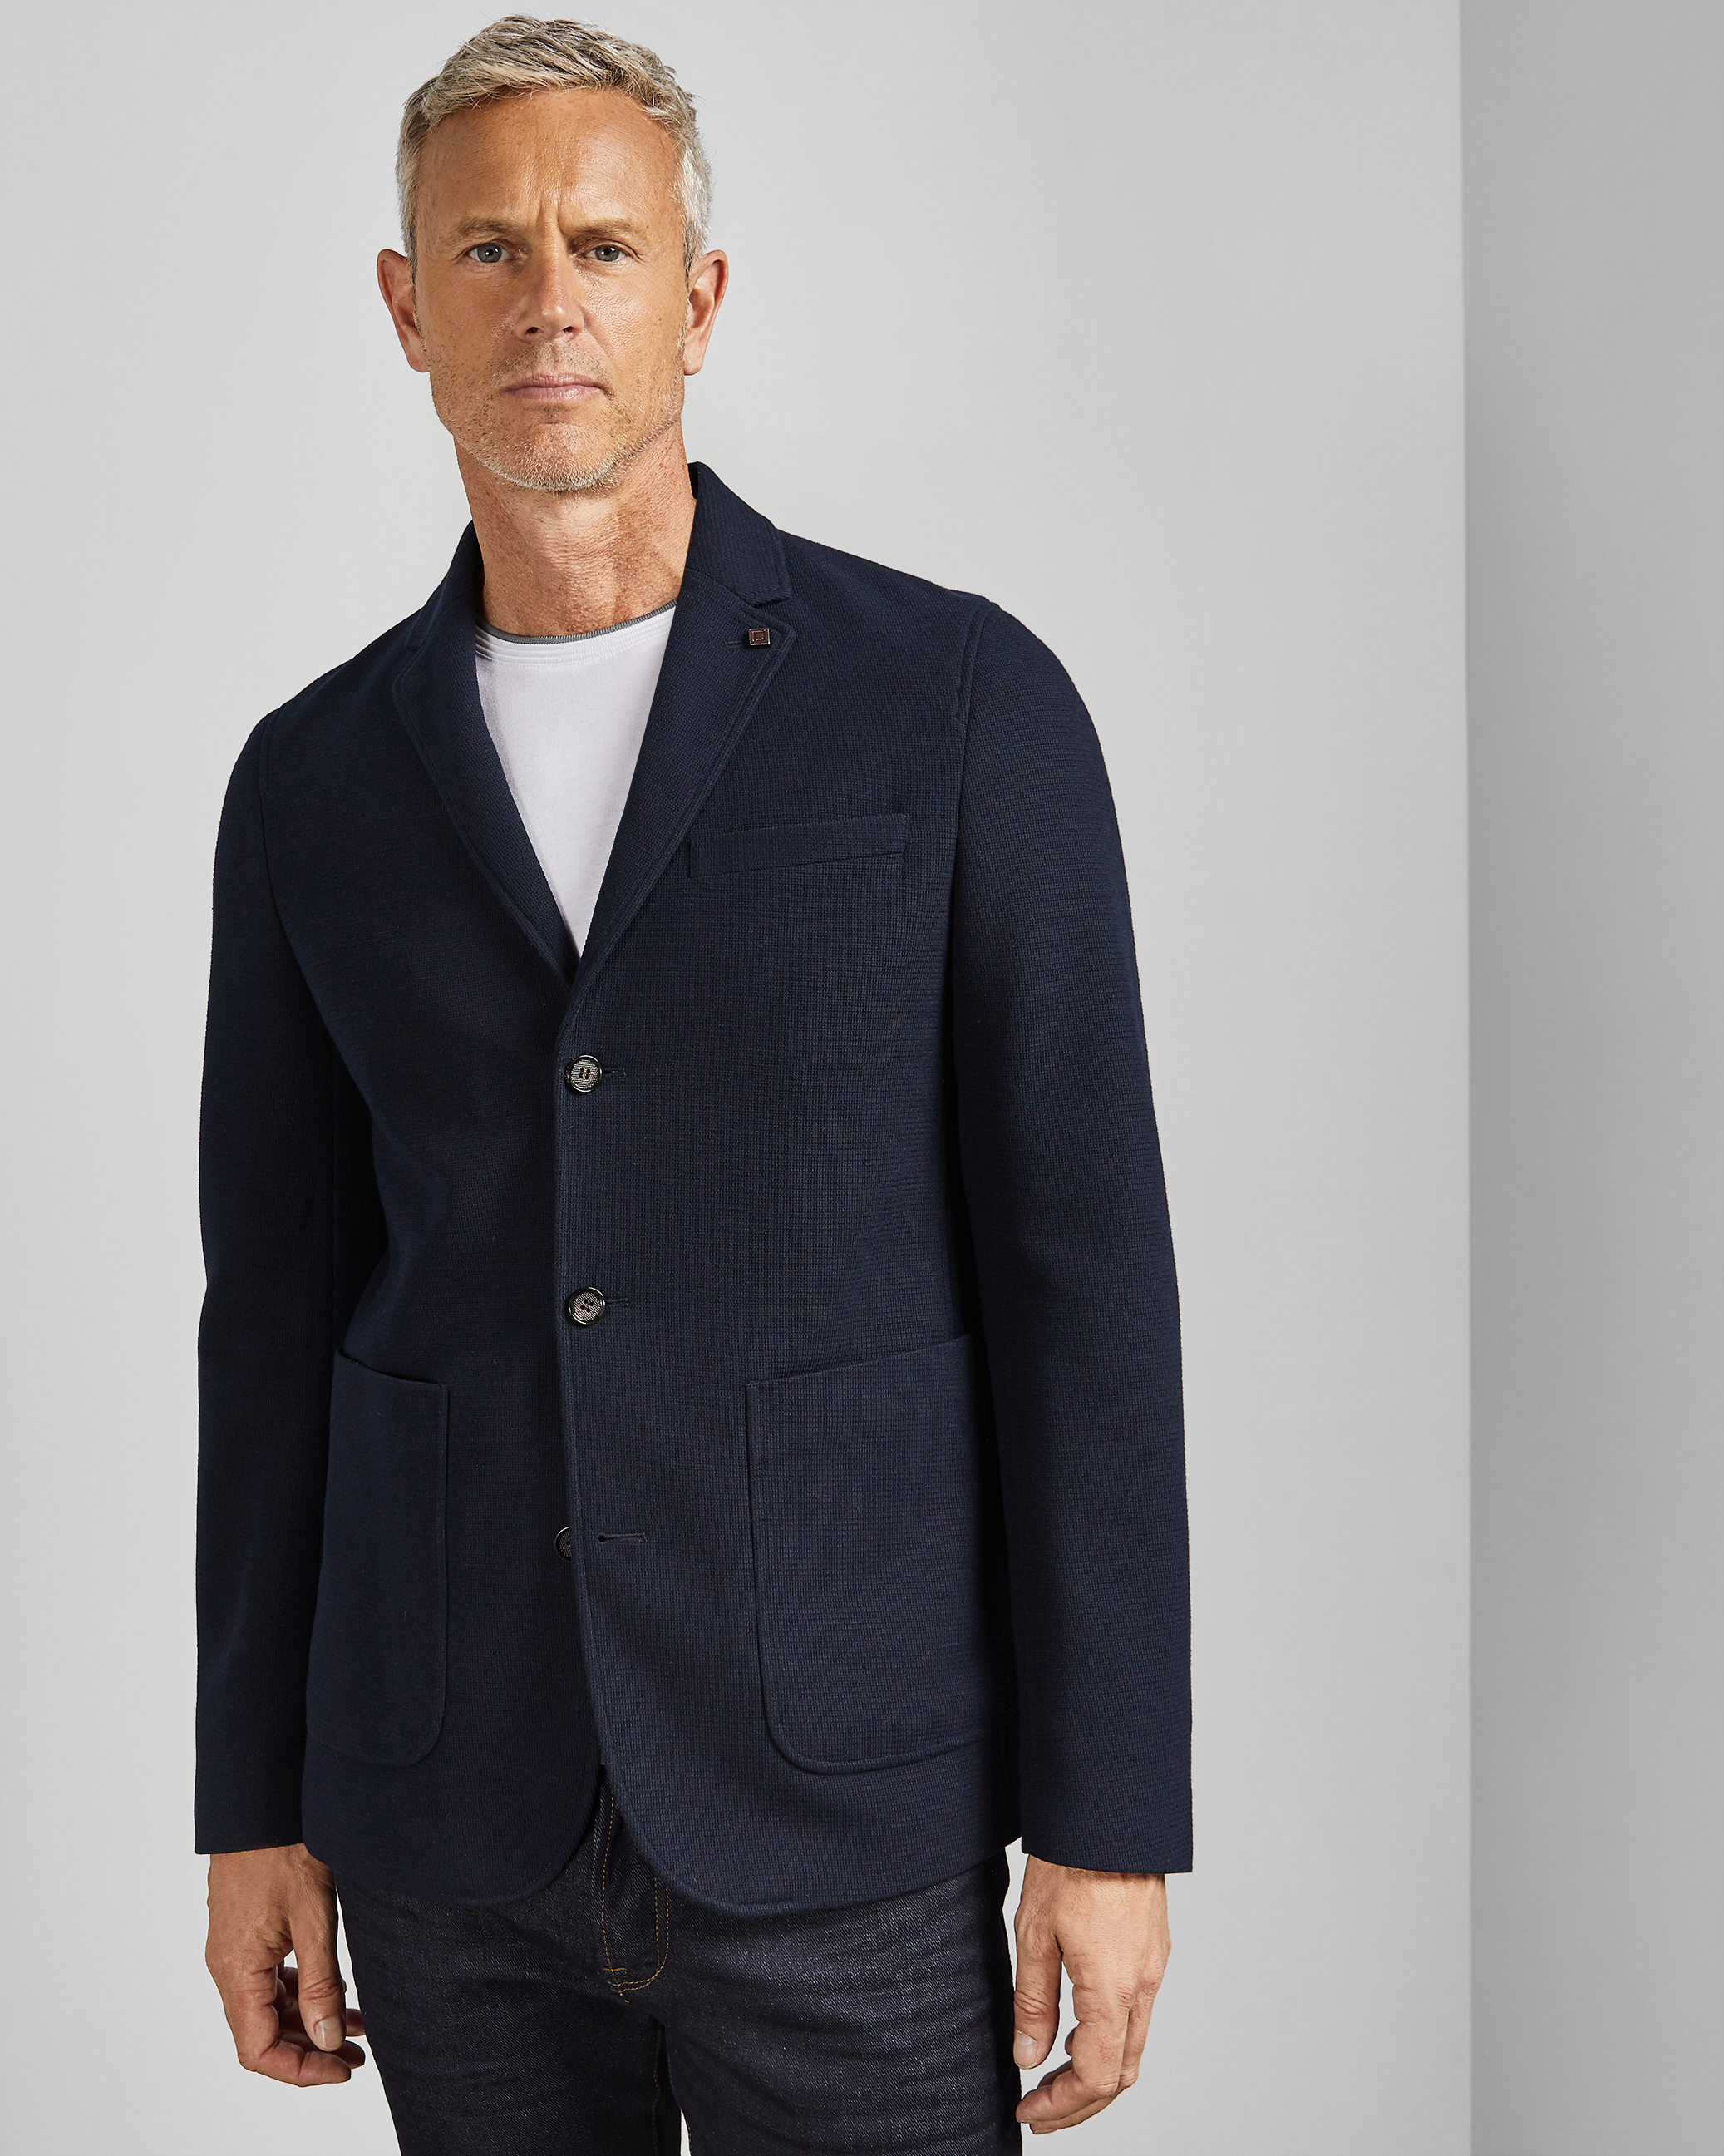 Veste en jersey avec doublure Tall for Ted Bleu marine